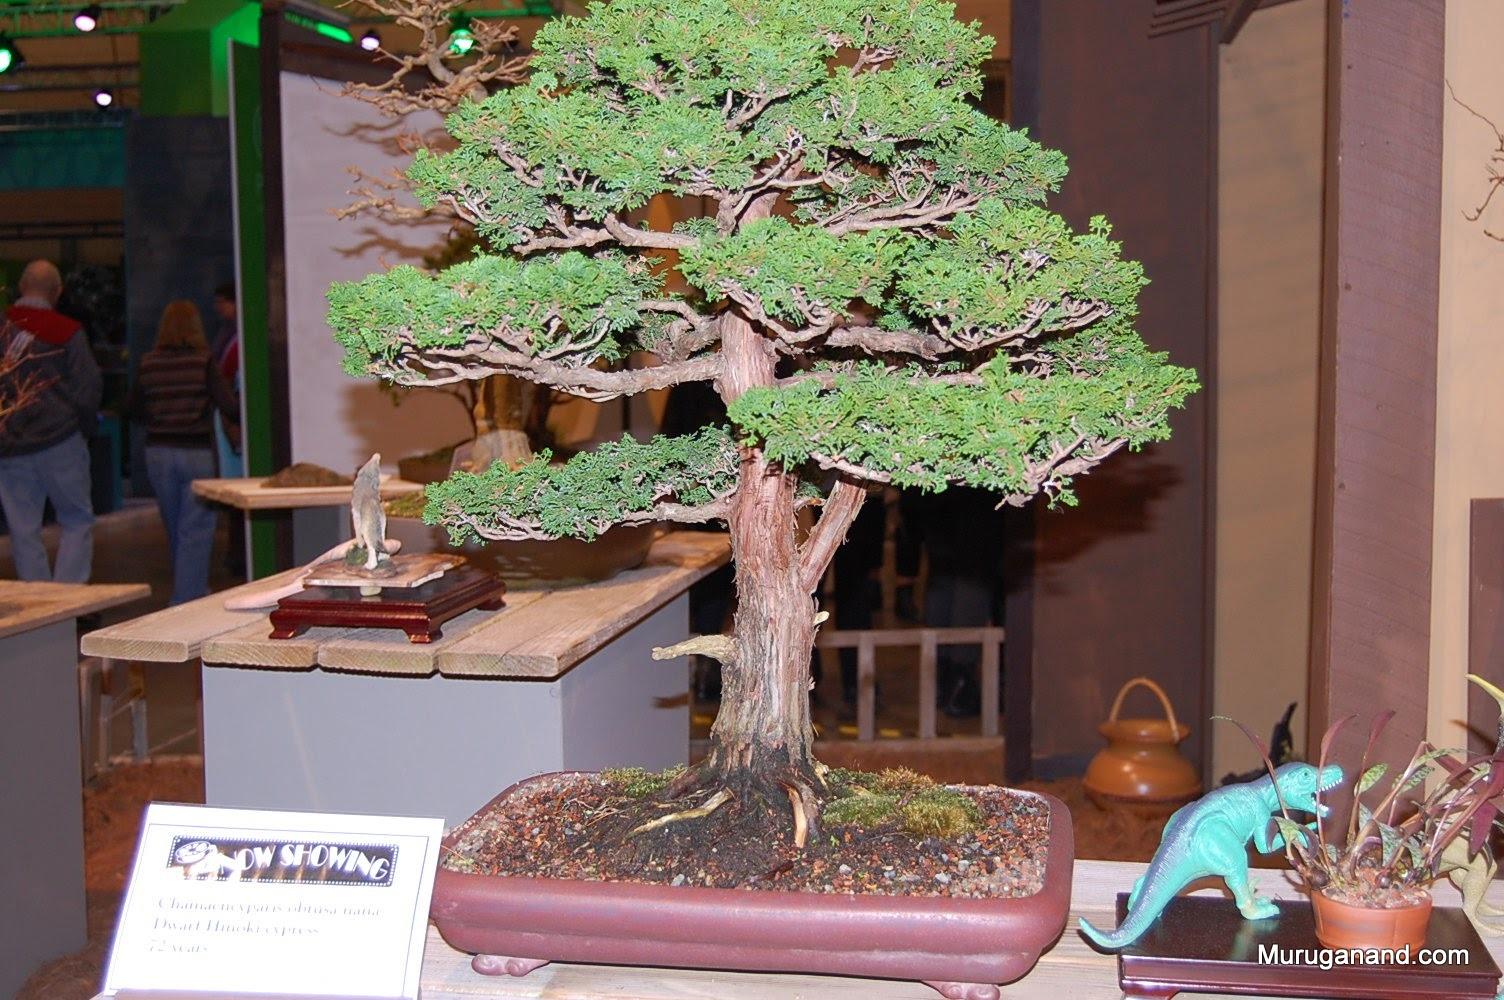 Dwarf hinoki cypress 72 years